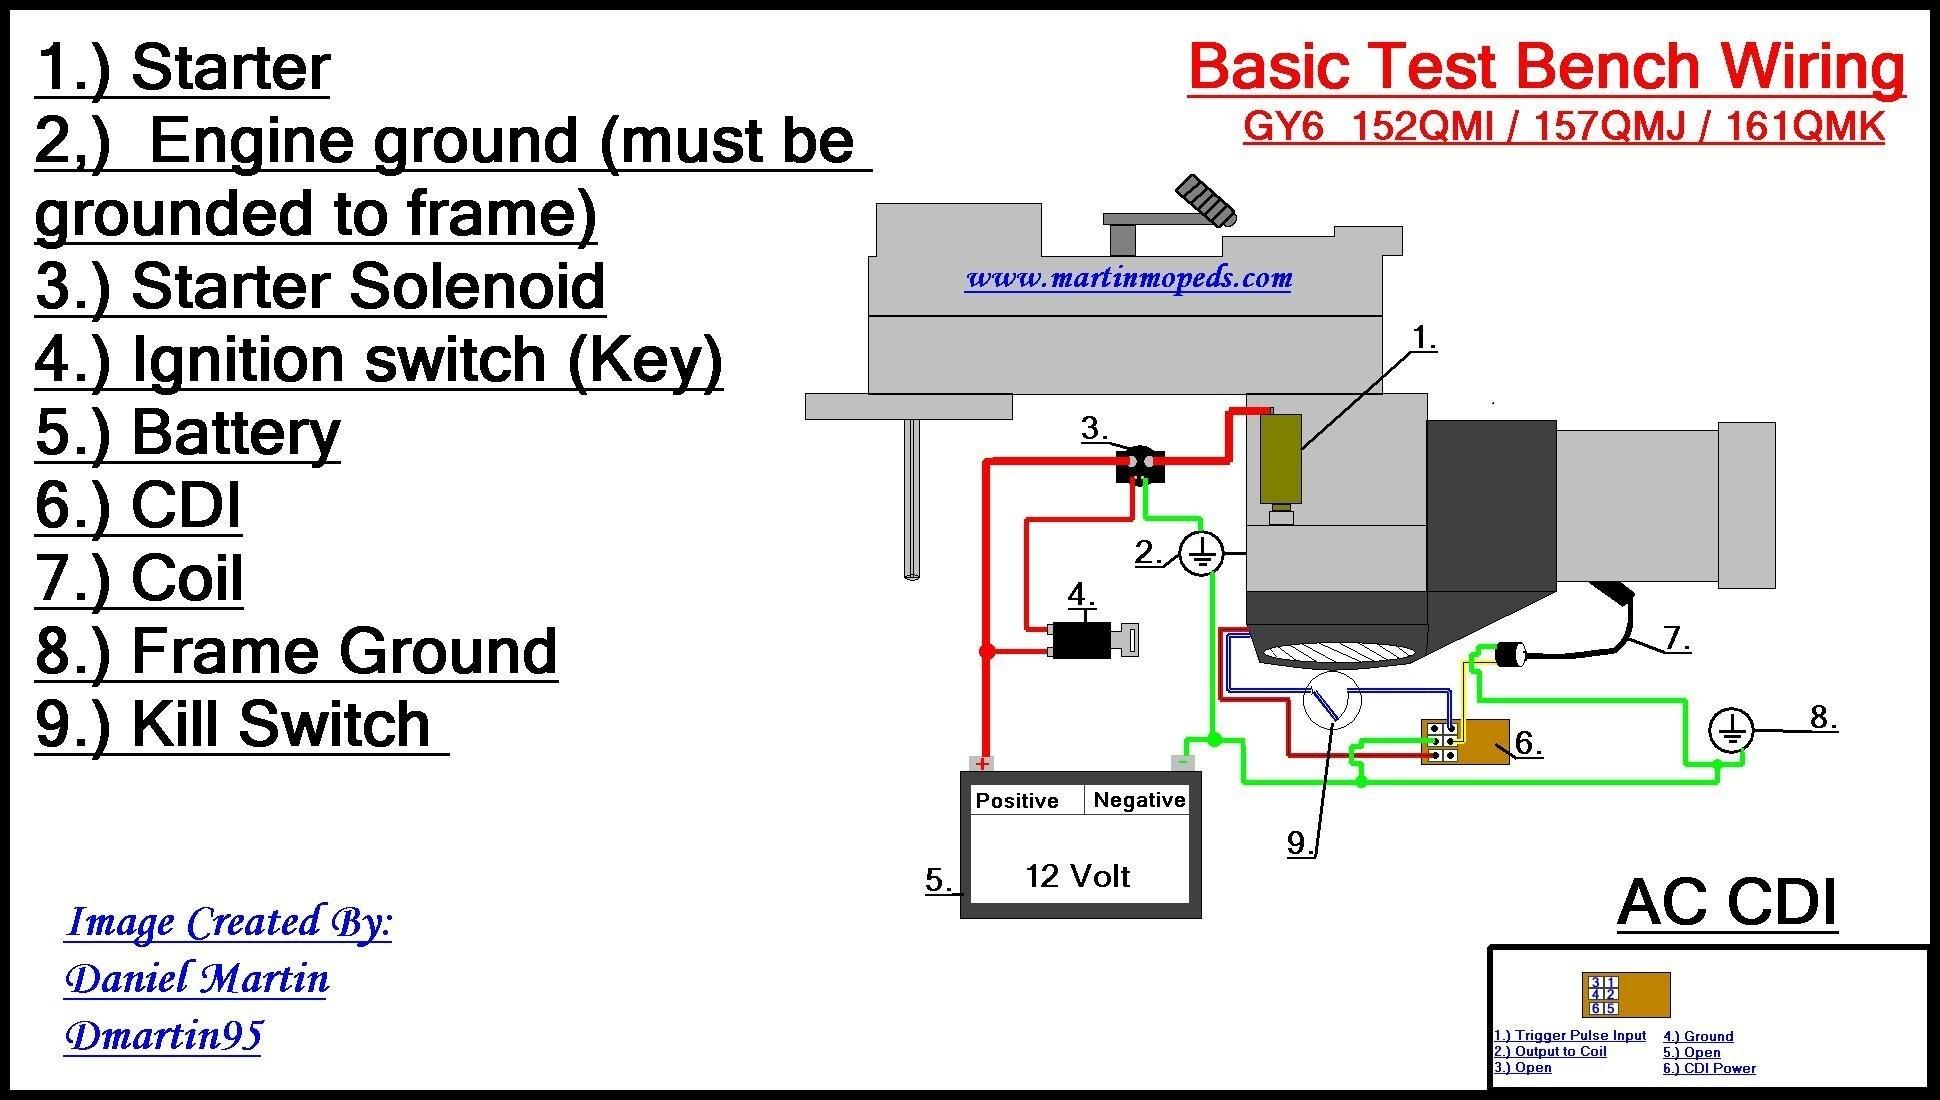 Engine test stand wiring diagram test block wiring diagram fresh engine test stand wiring diagram test block wiring diagram fresh test block wiring diagram copy test swarovskicordoba Choice Image